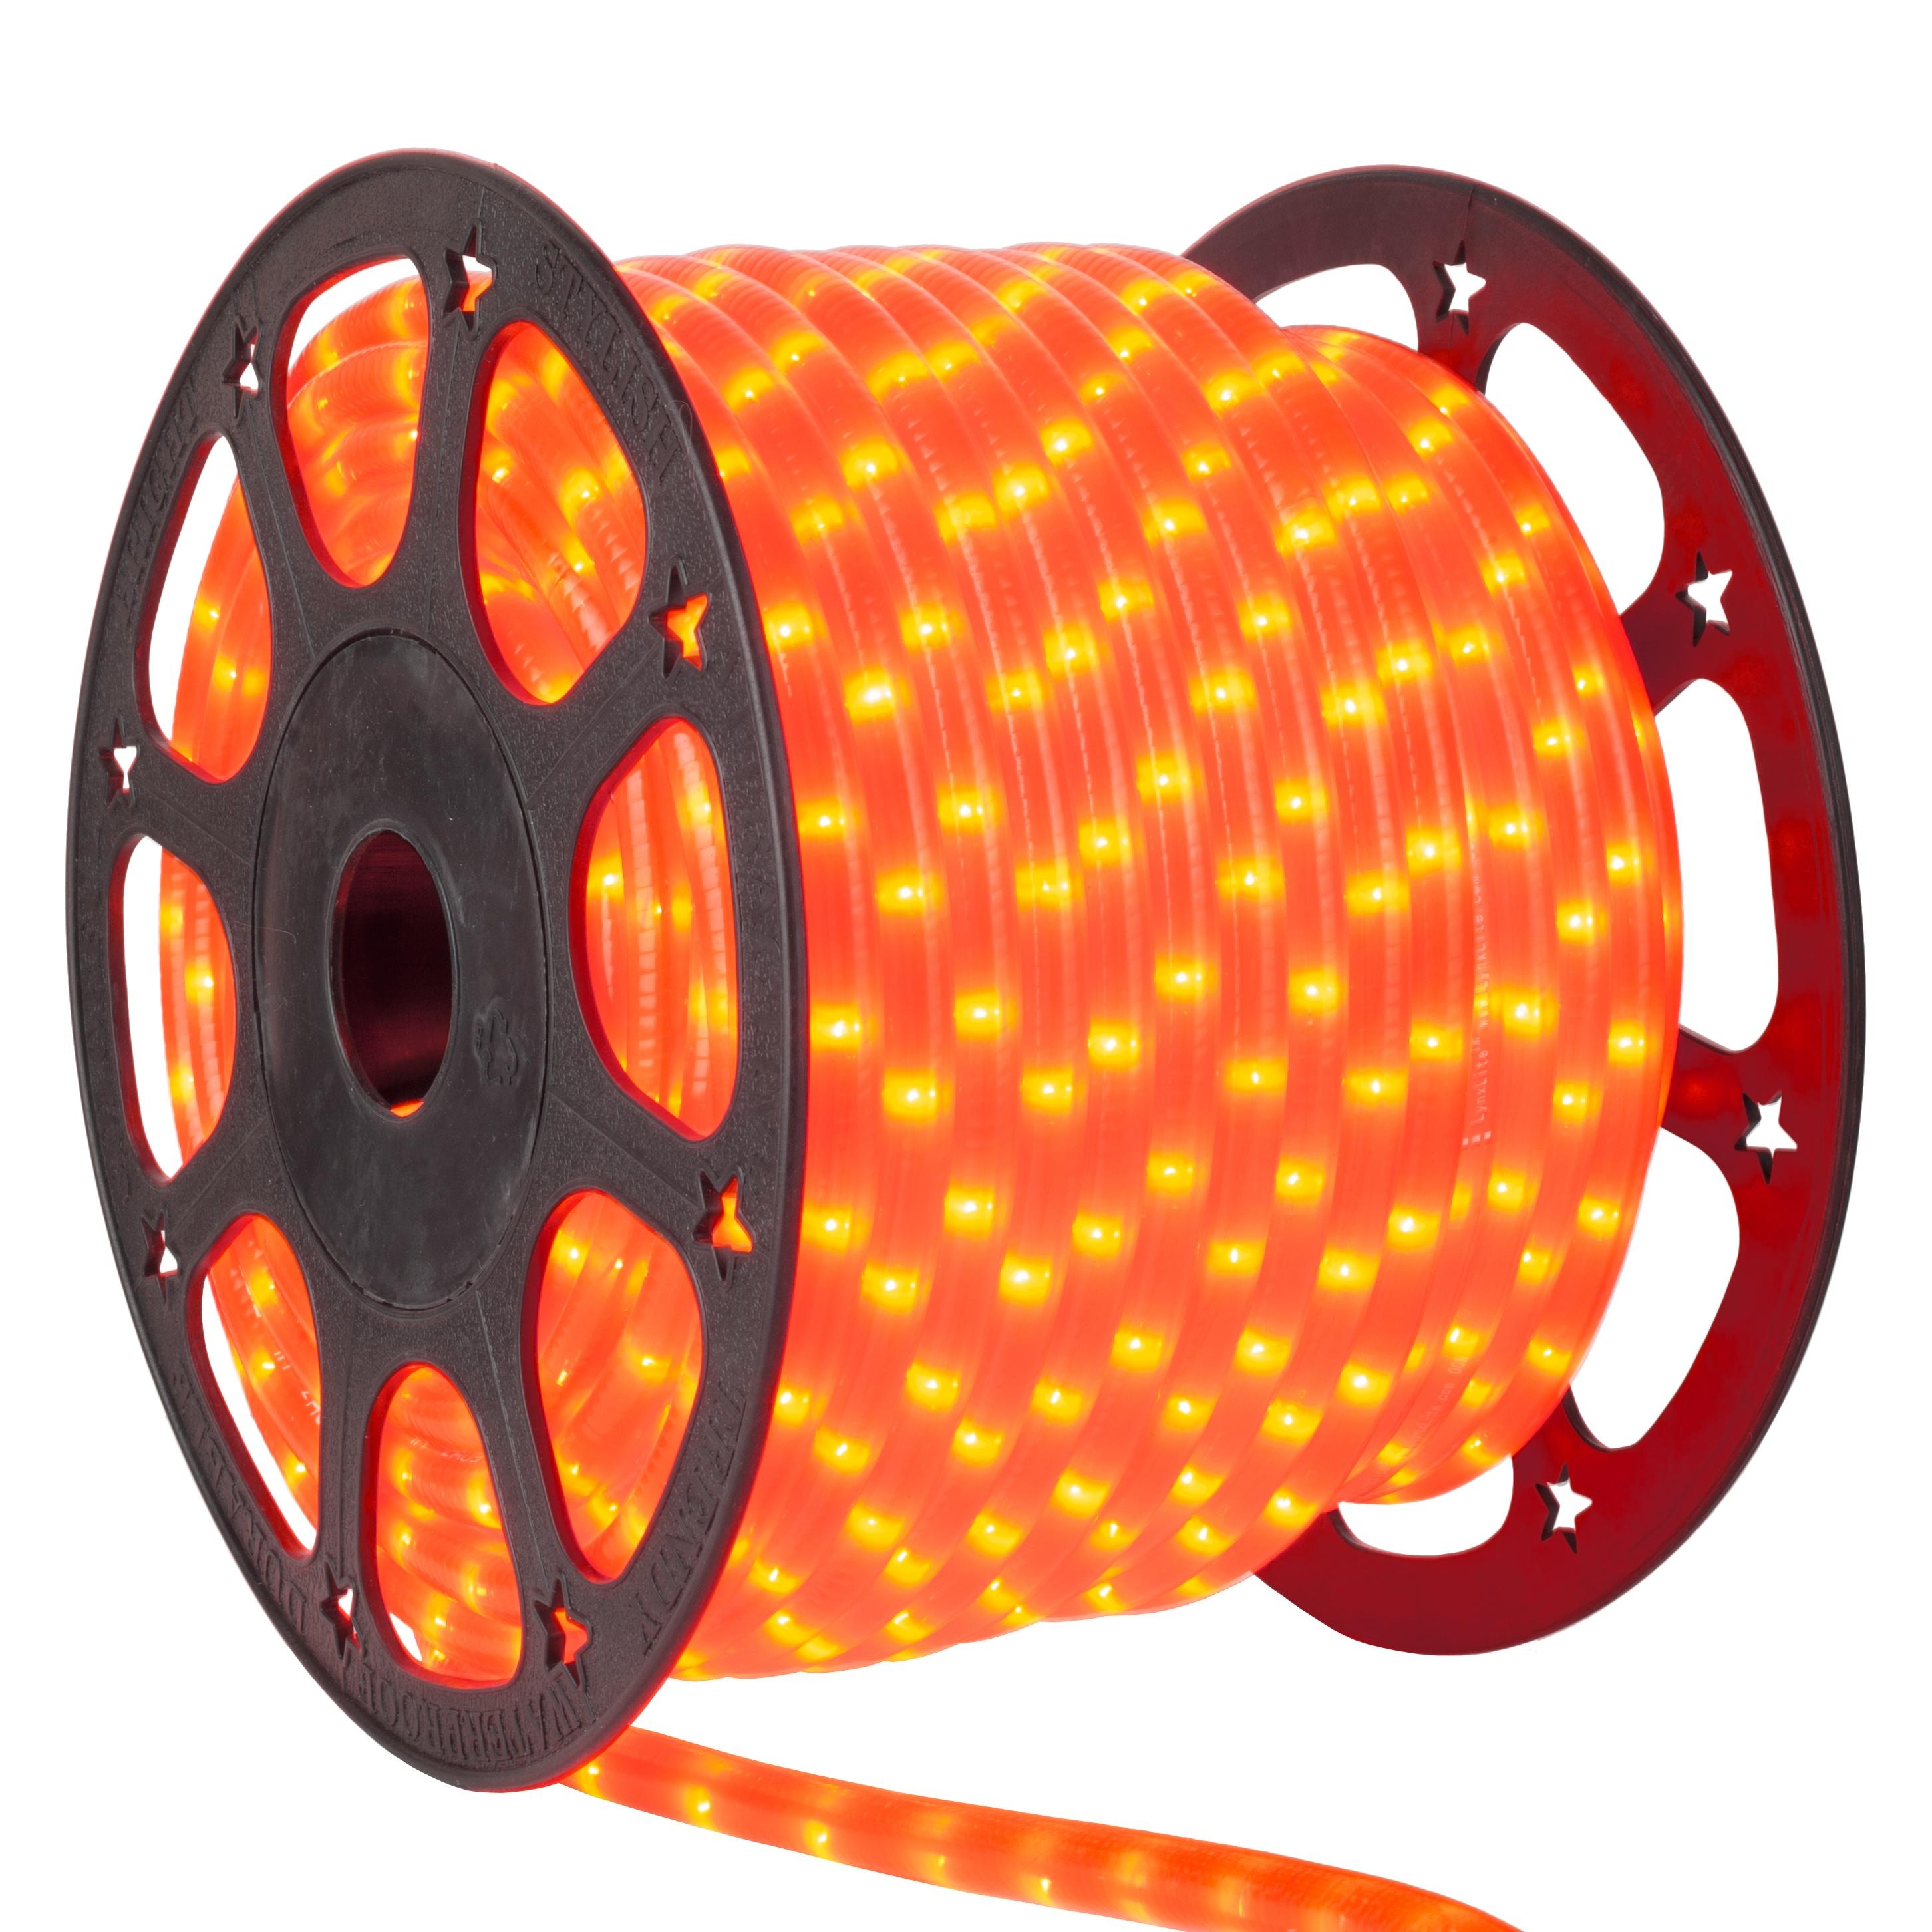 Rope light 150 orange mini rope light commercial spool 120 volt aloadofball Choice Image